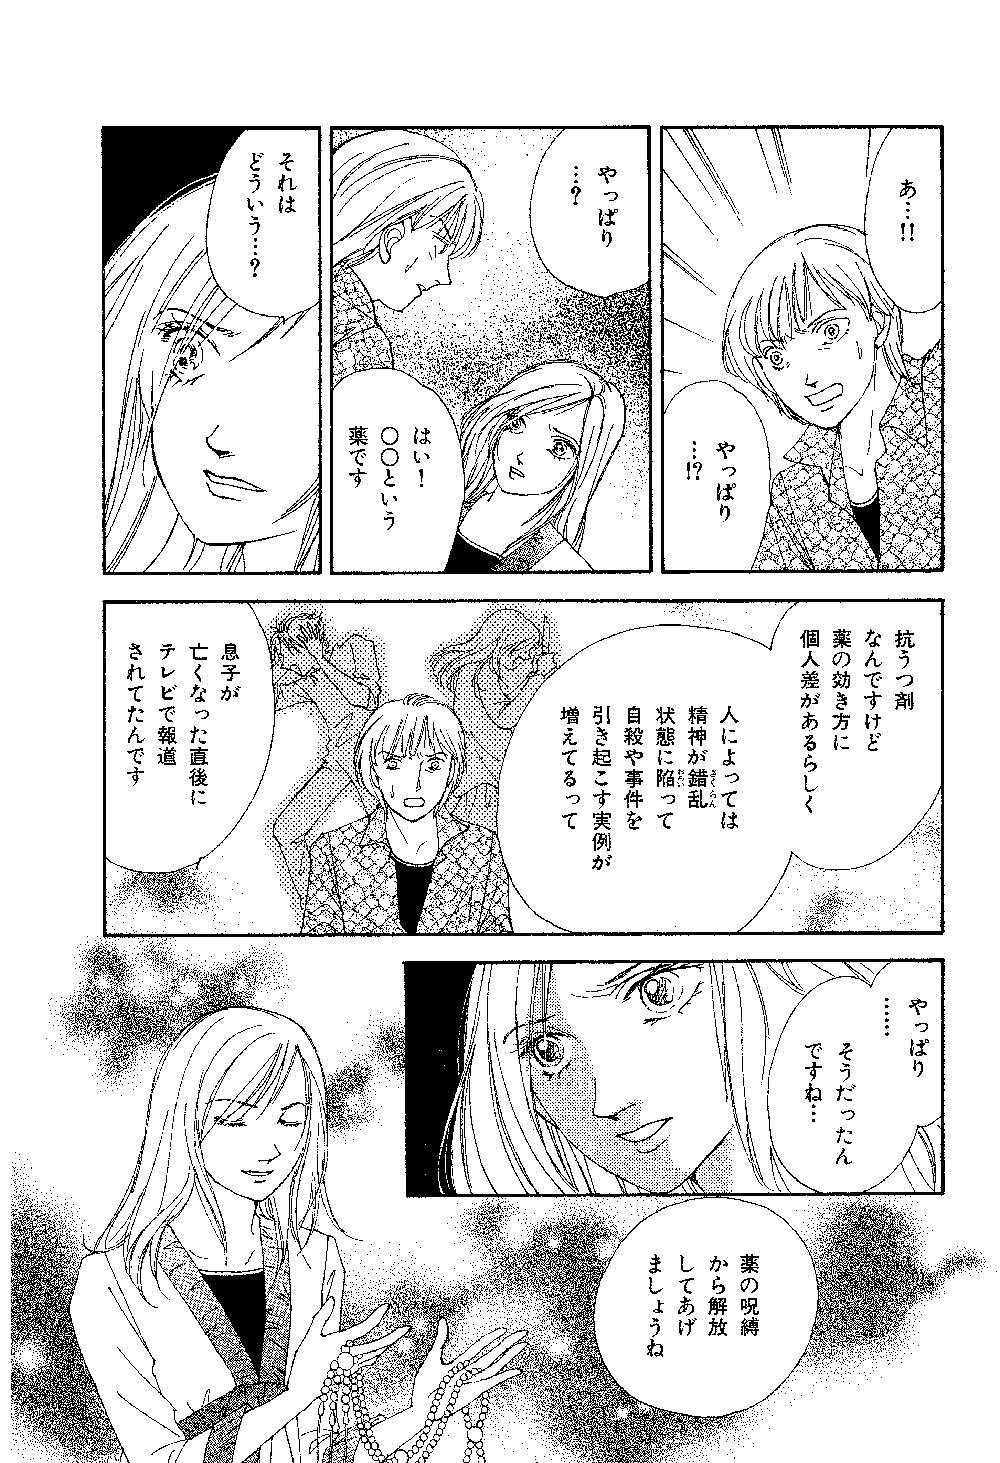 mayuri_0001_0028.jpg